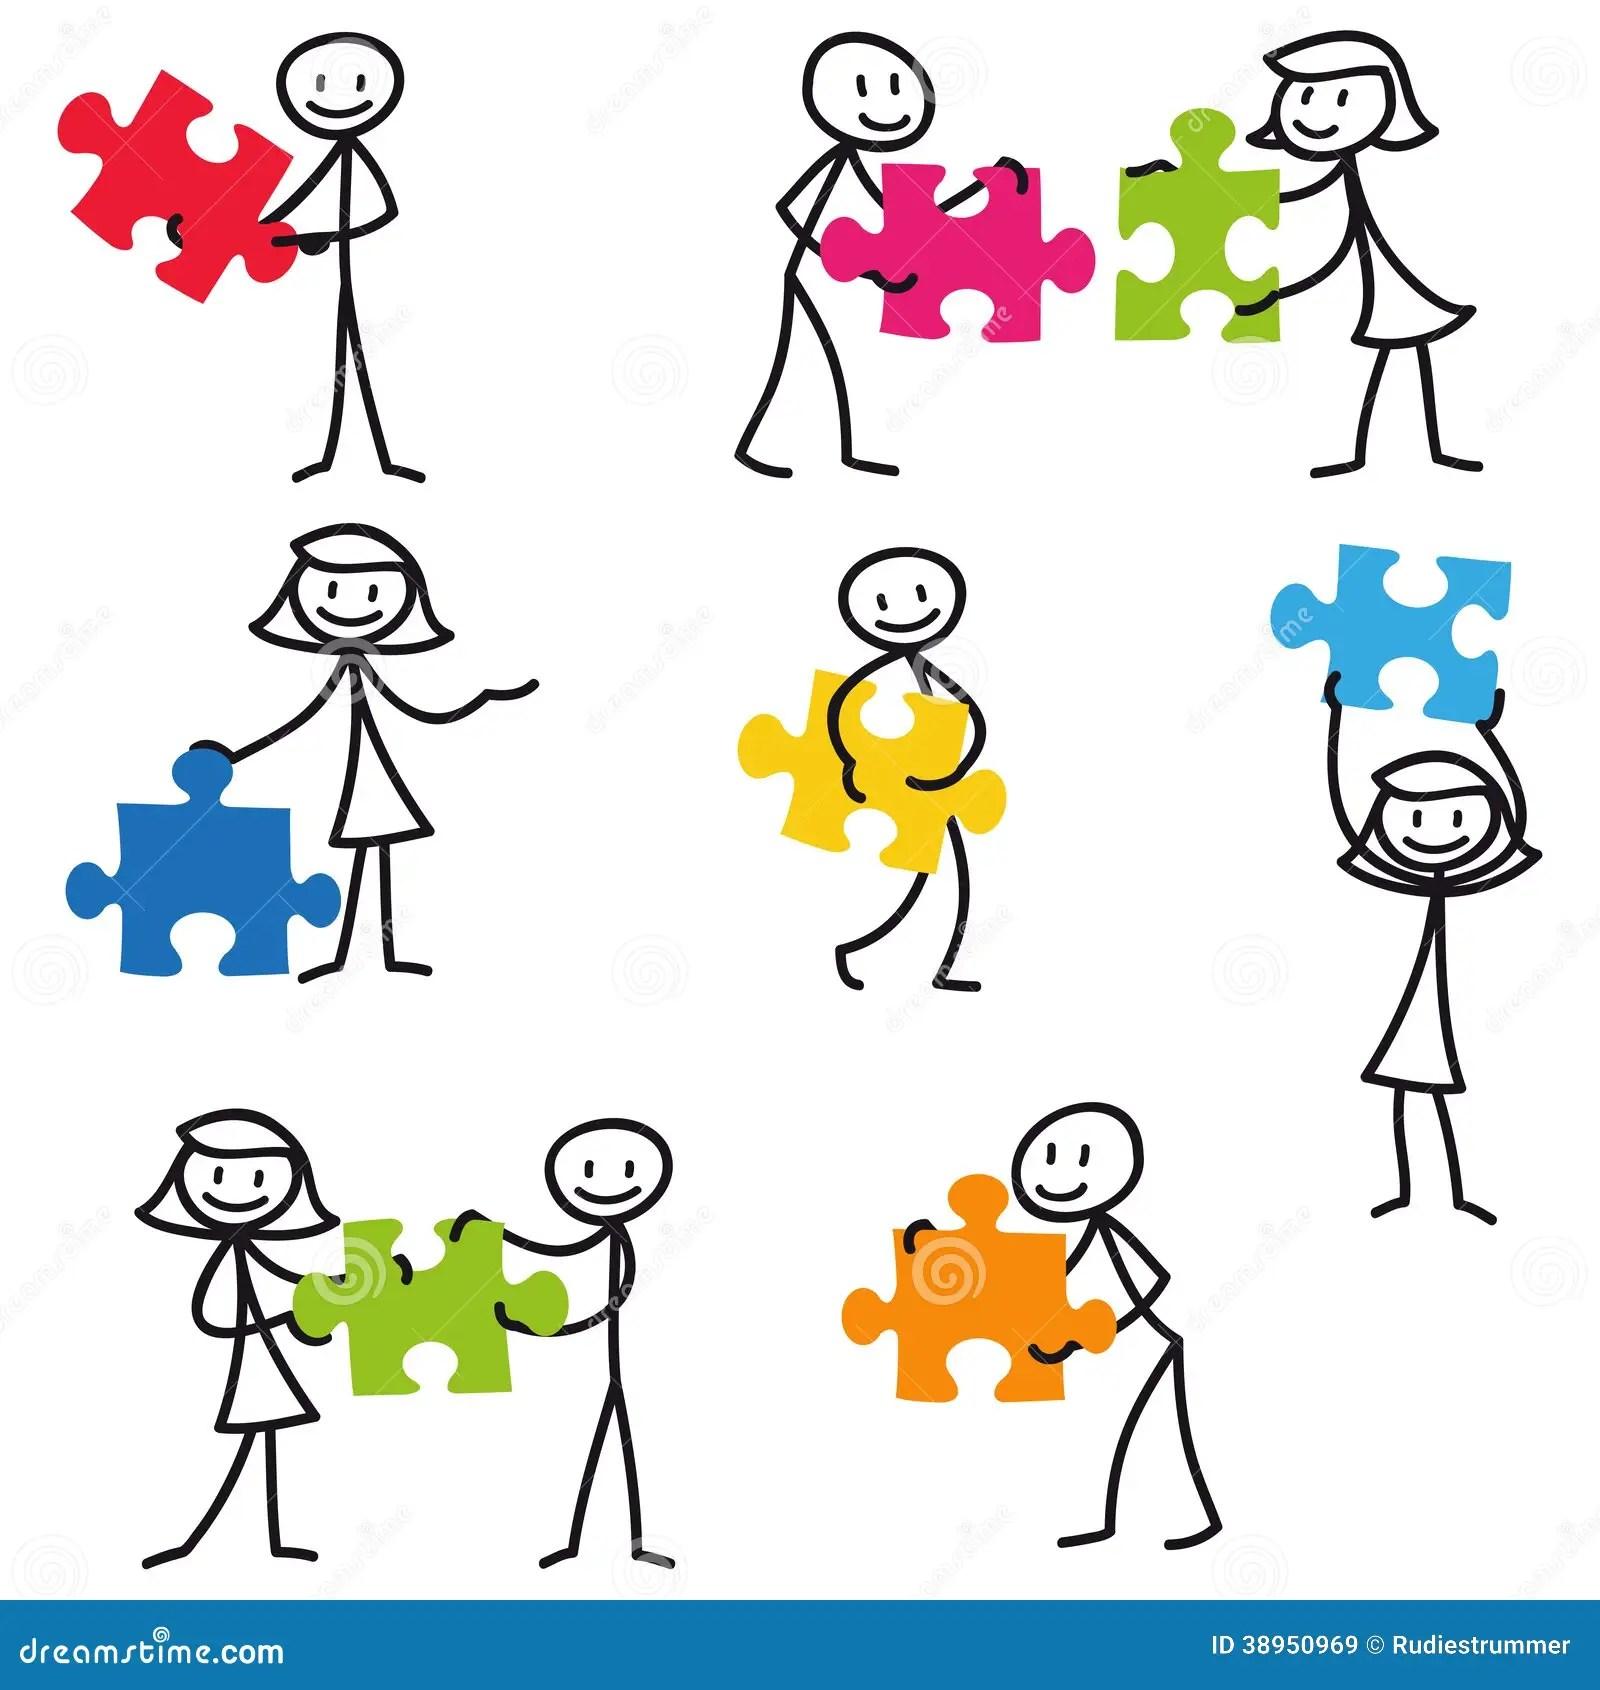 Stick Man Stick Figure Jigsaw Puzzle Stock Vector